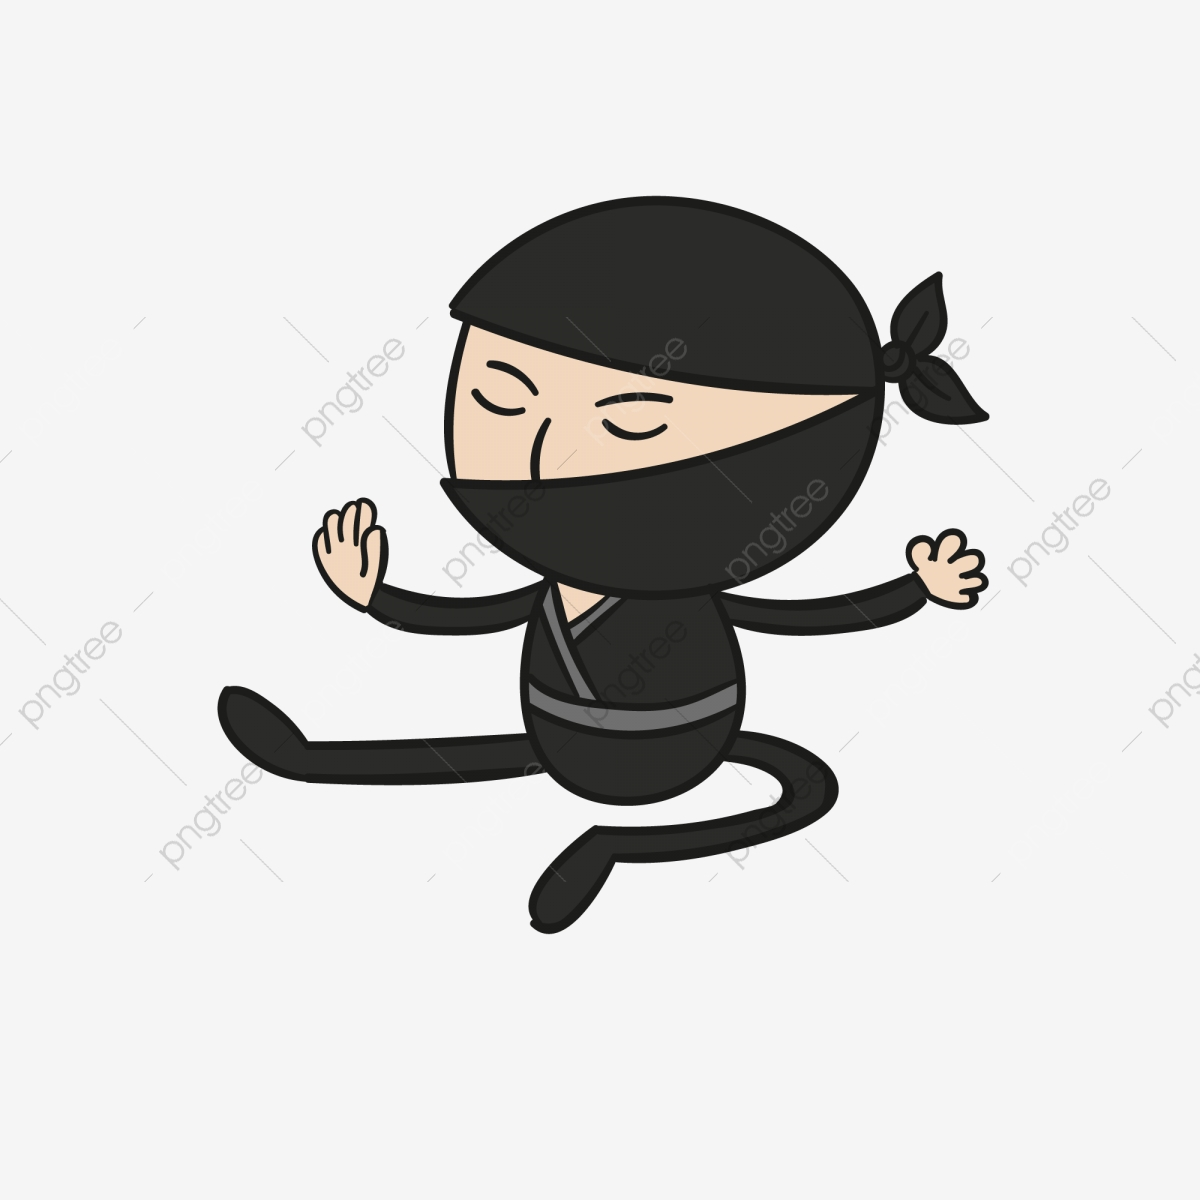 Ninja Jepang Ninja Melompat Ninja Ninja Kartun Ninja